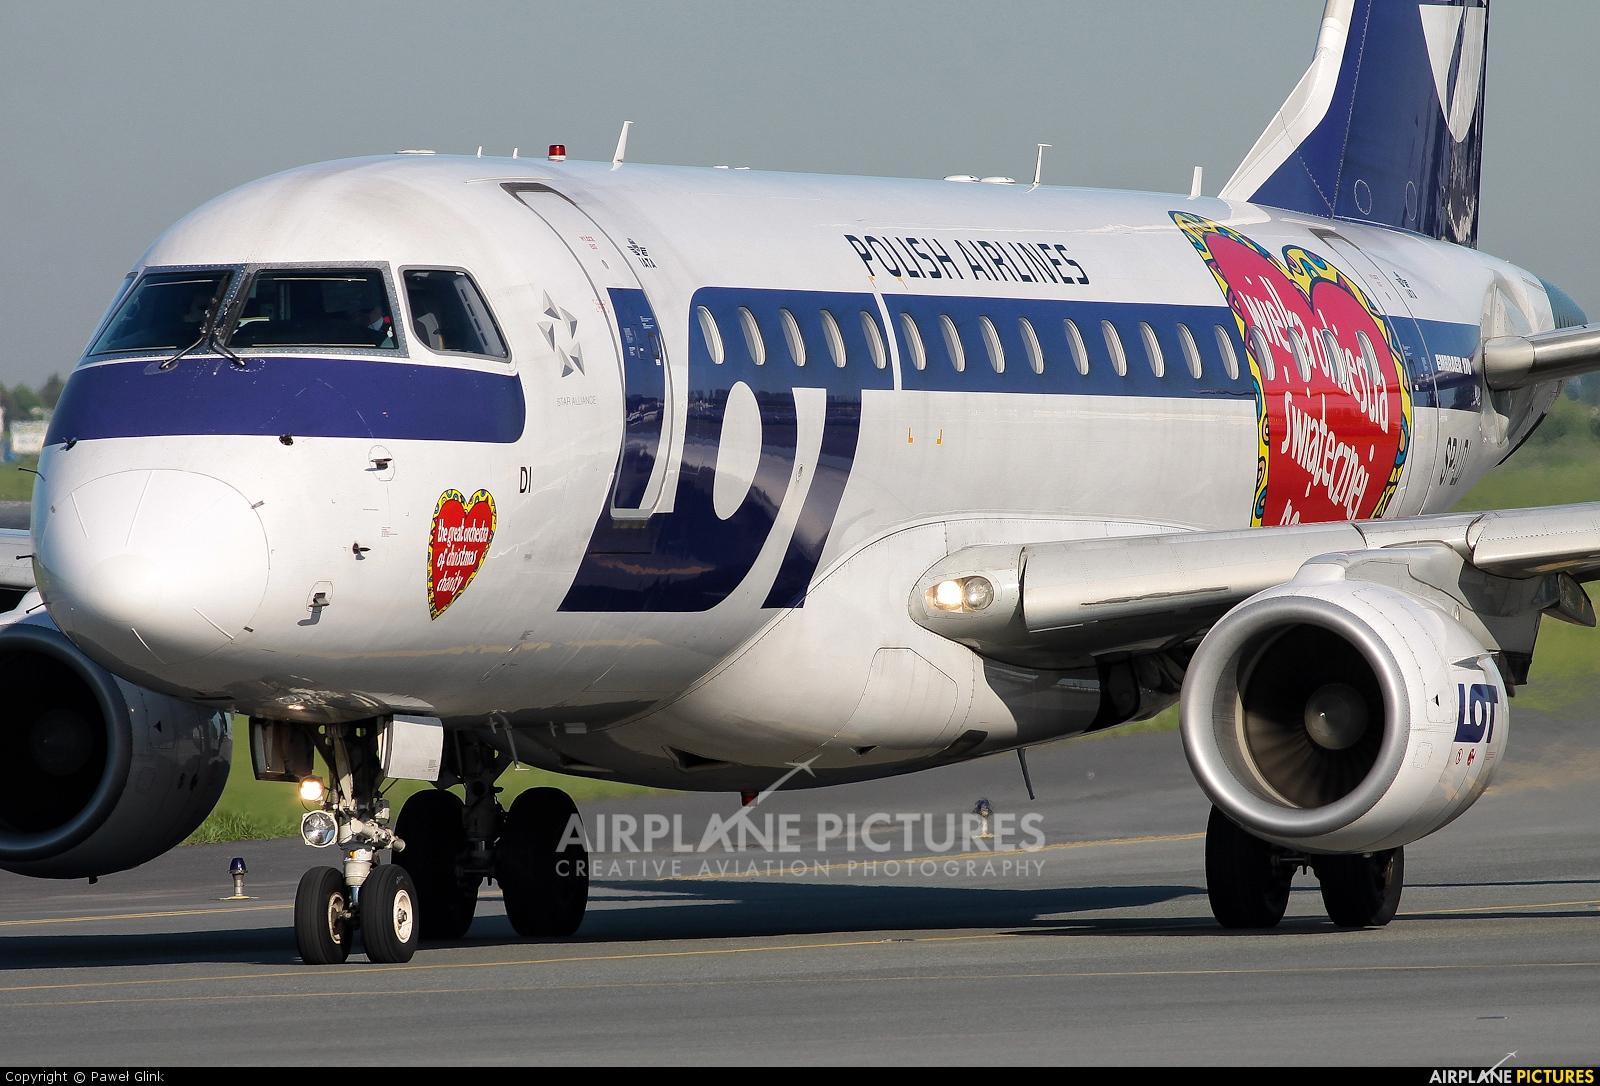 LOT - Polish Airlines SP-LDI aircraft at Warsaw - Frederic Chopin